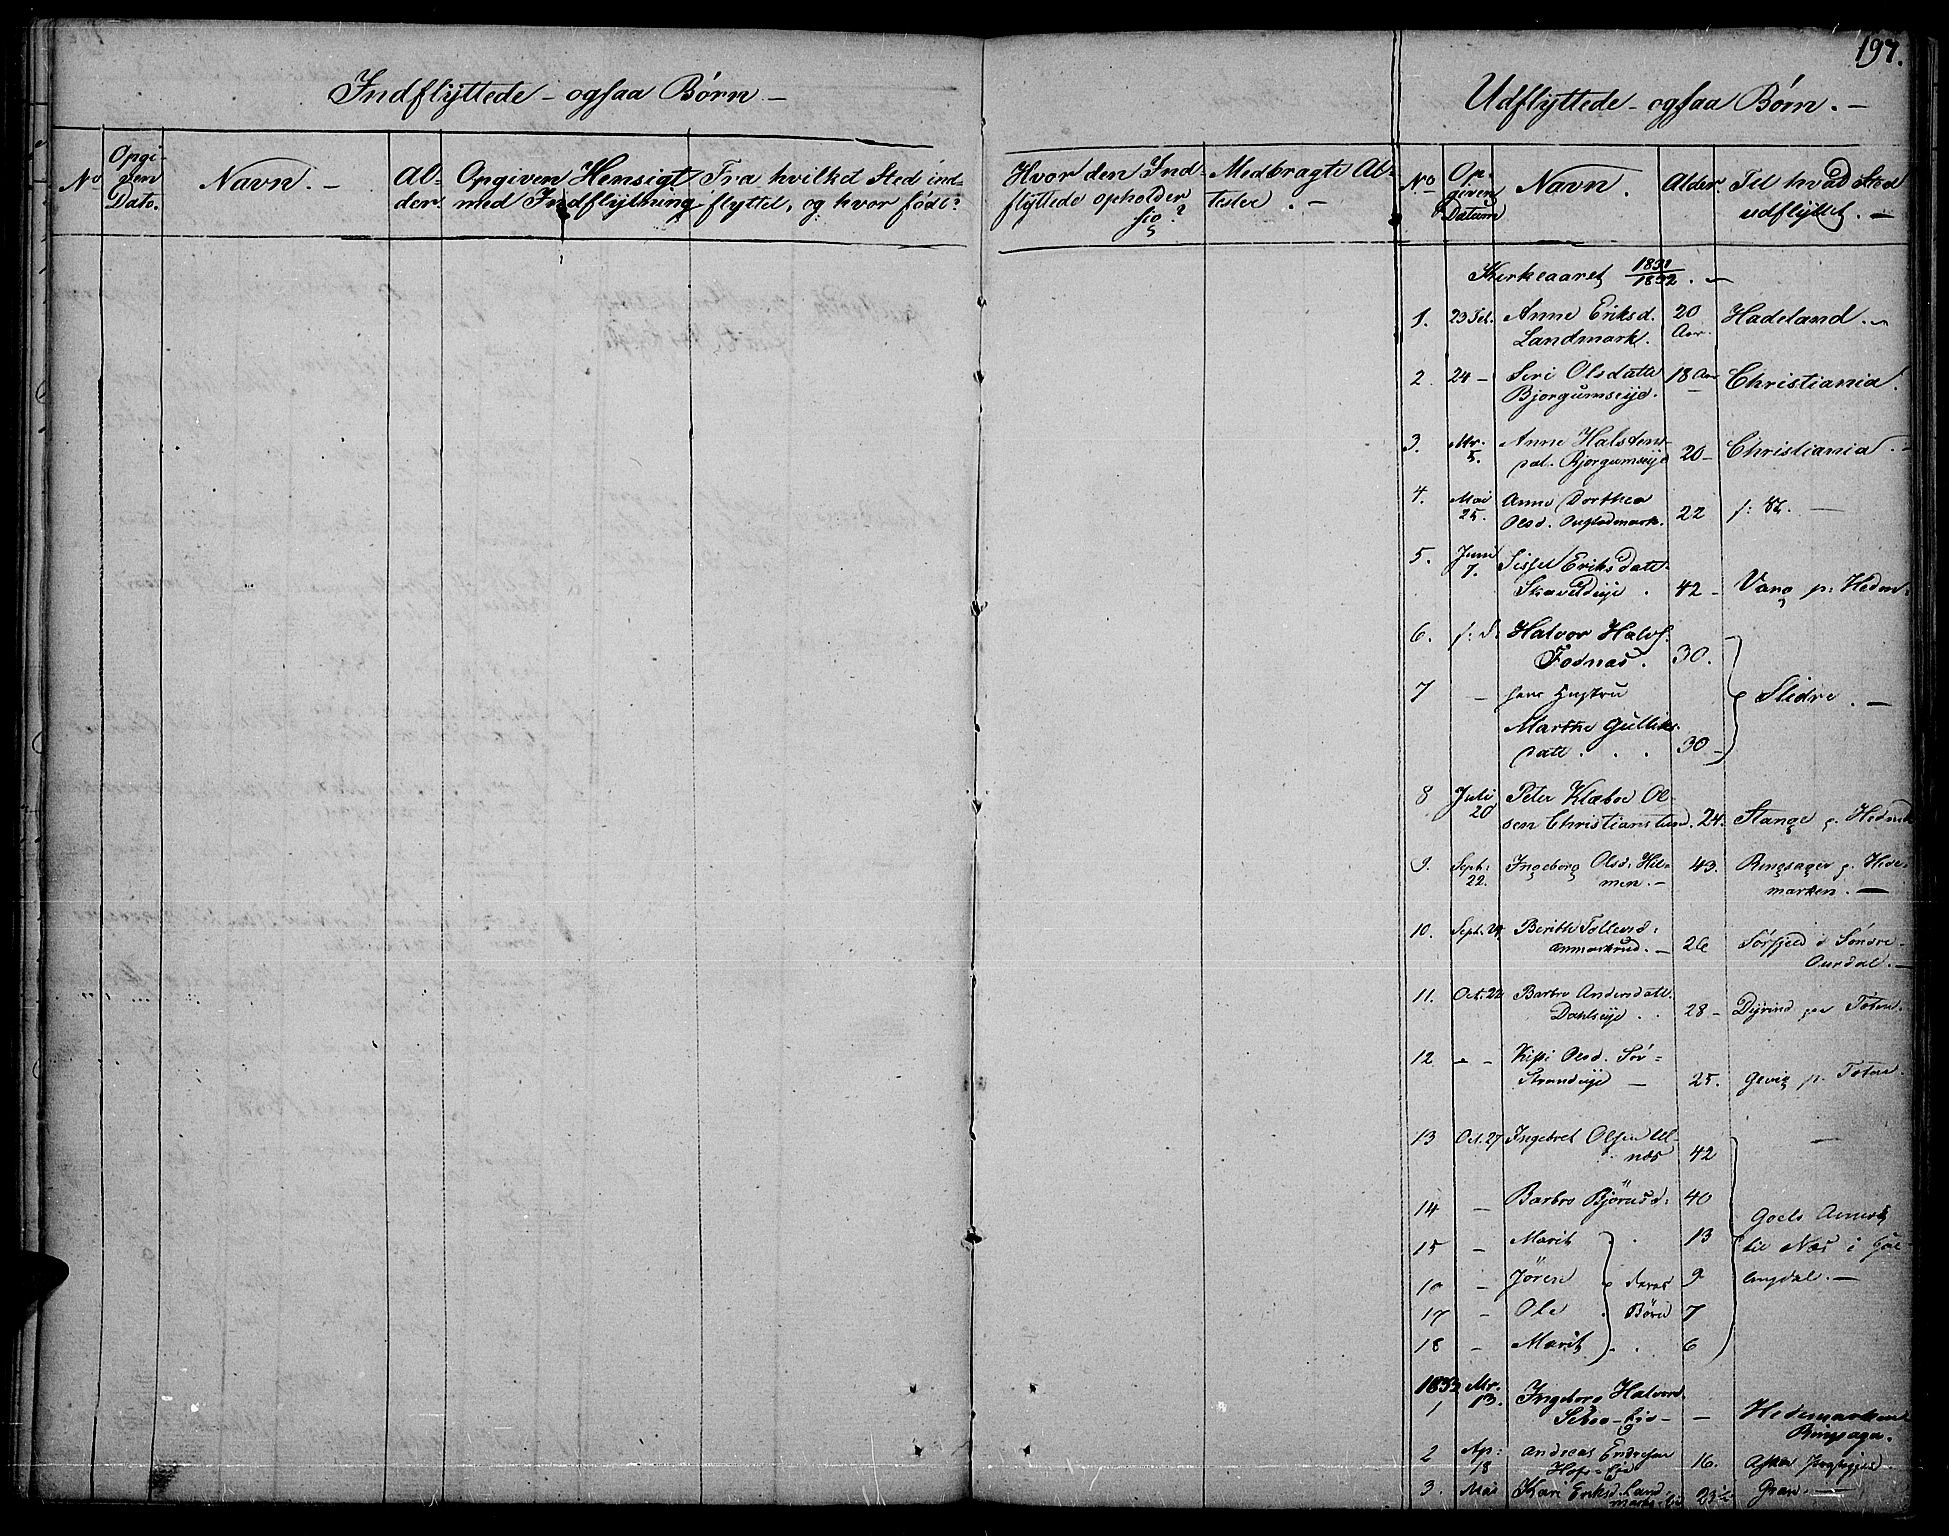 SAH, Nord-Aurdal prestekontor, Ministerialbok nr. 3, 1828-1841, s. 197